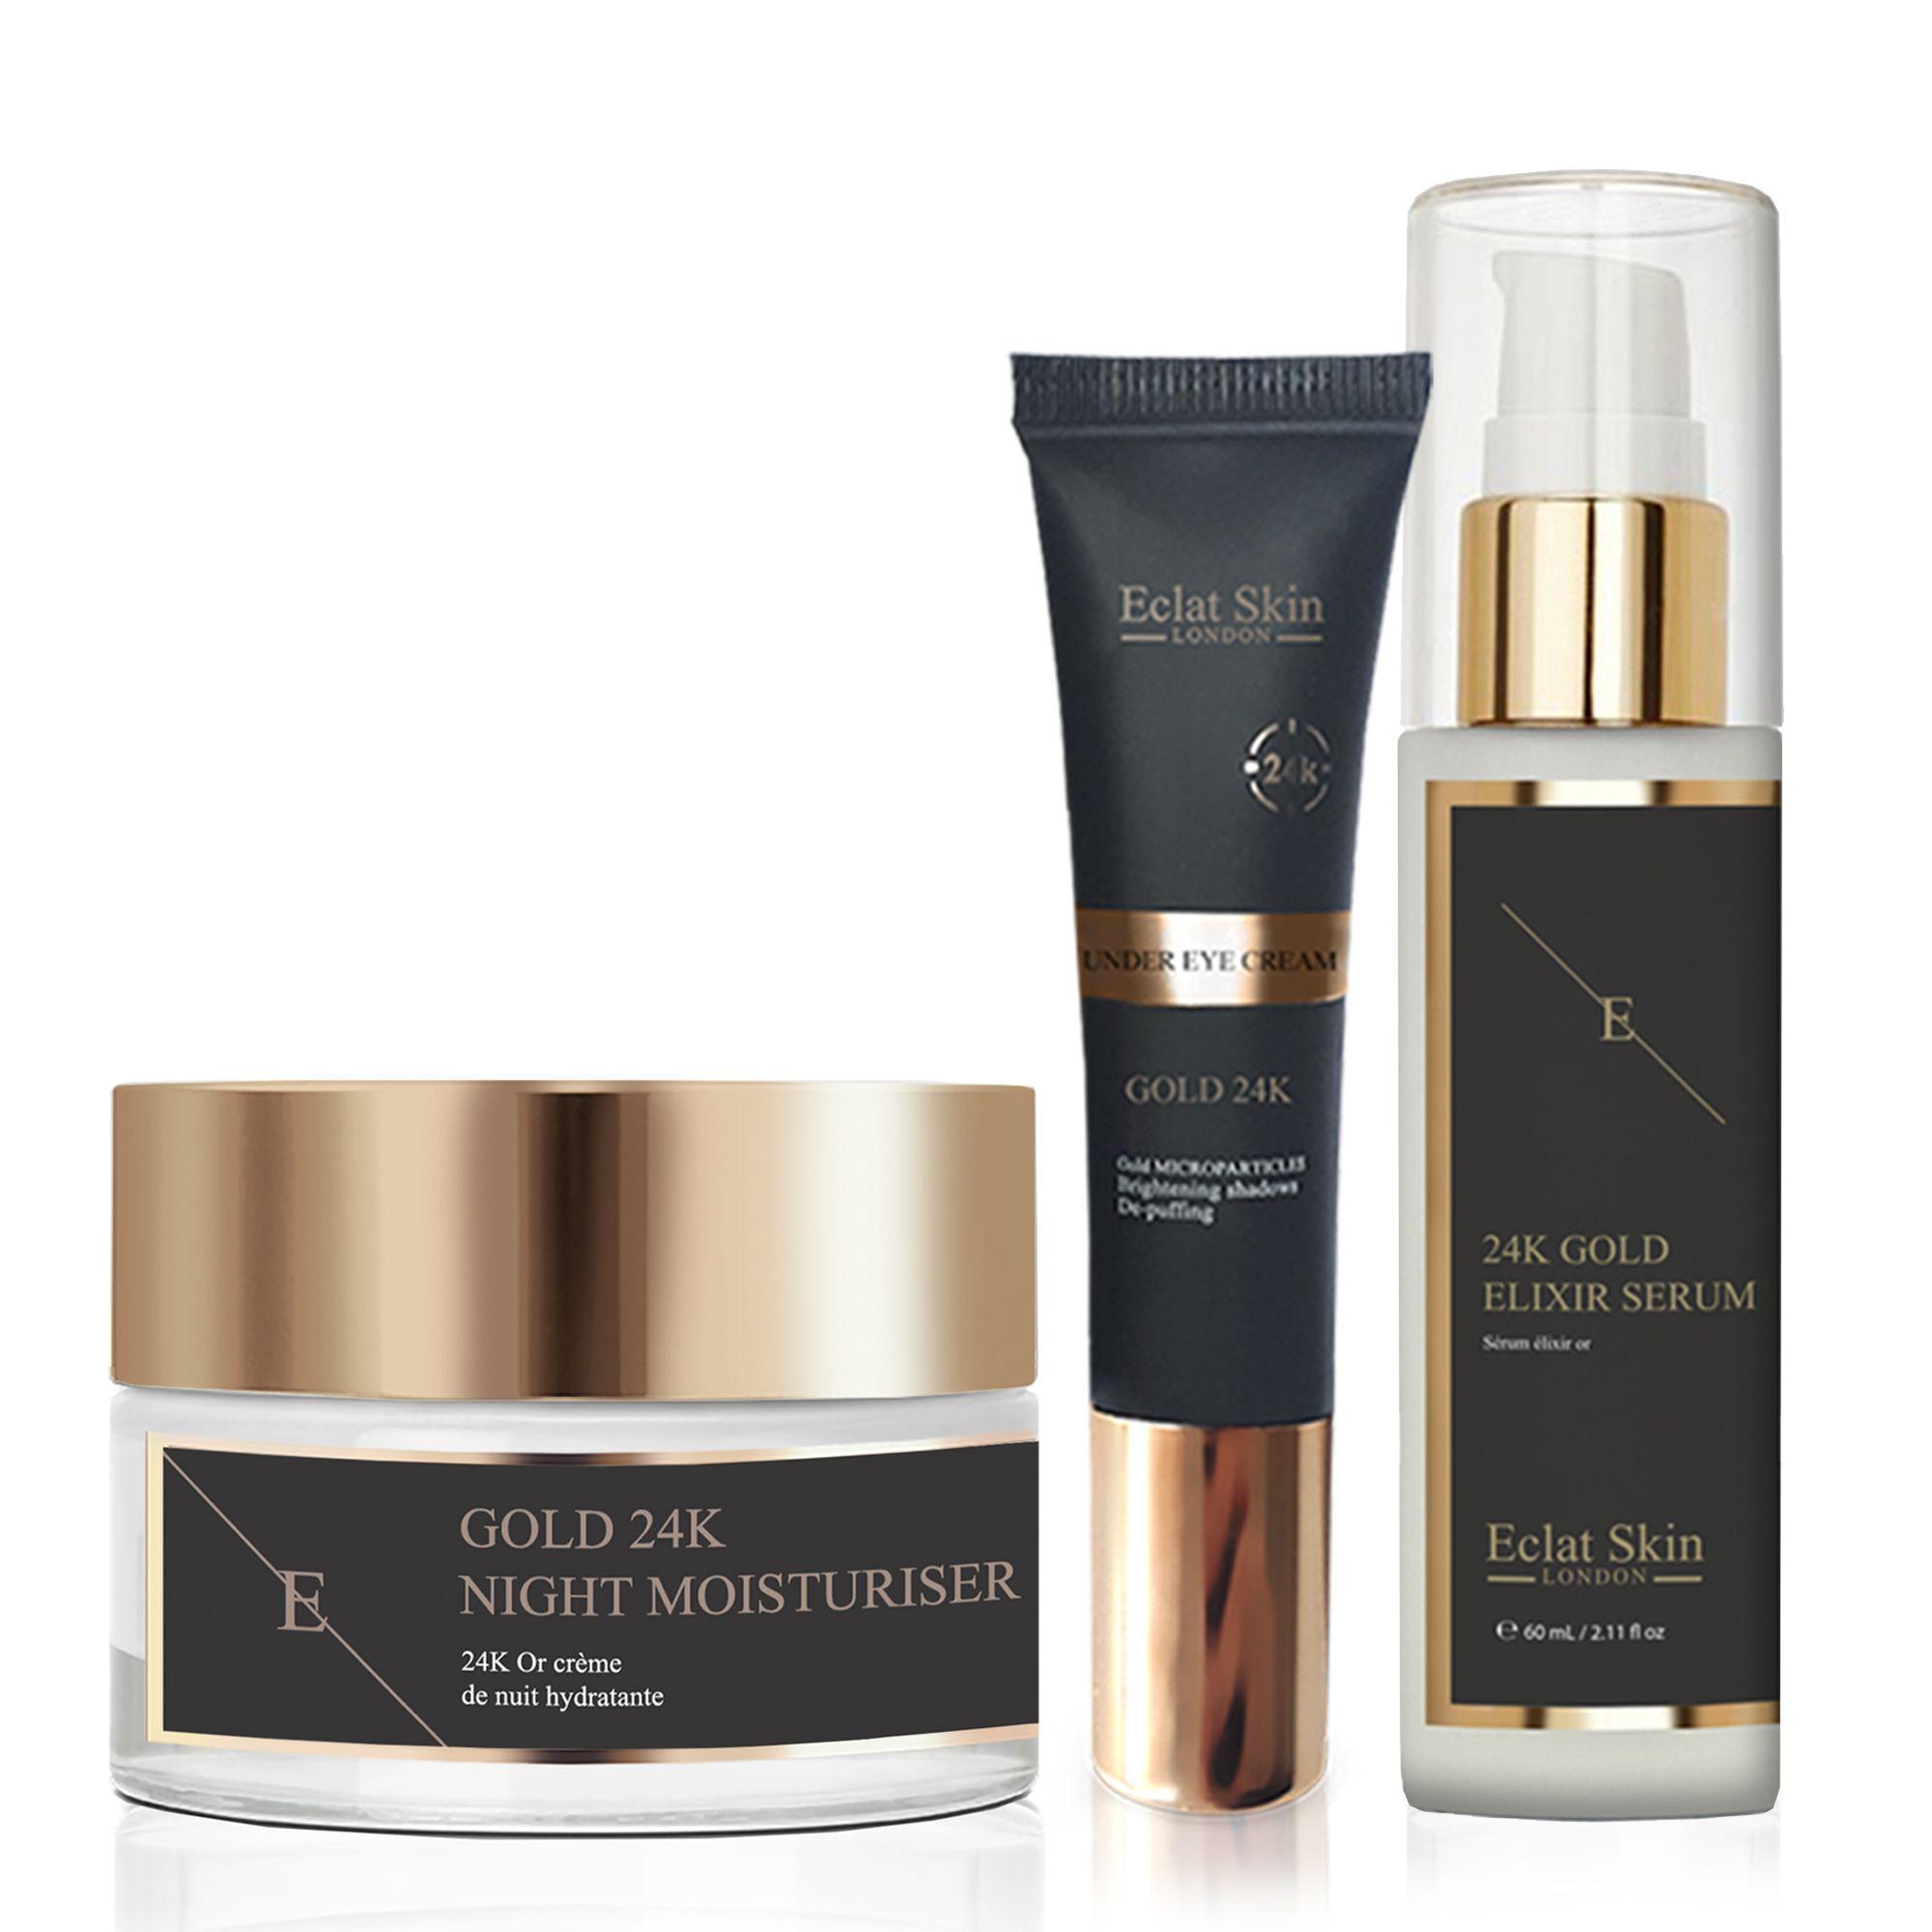 Anti-Wrinkle Elixir Serum 24K + Anti-Wrinkle Night Moisturiser 24K Gold + Under Eye Cream 24K Gold